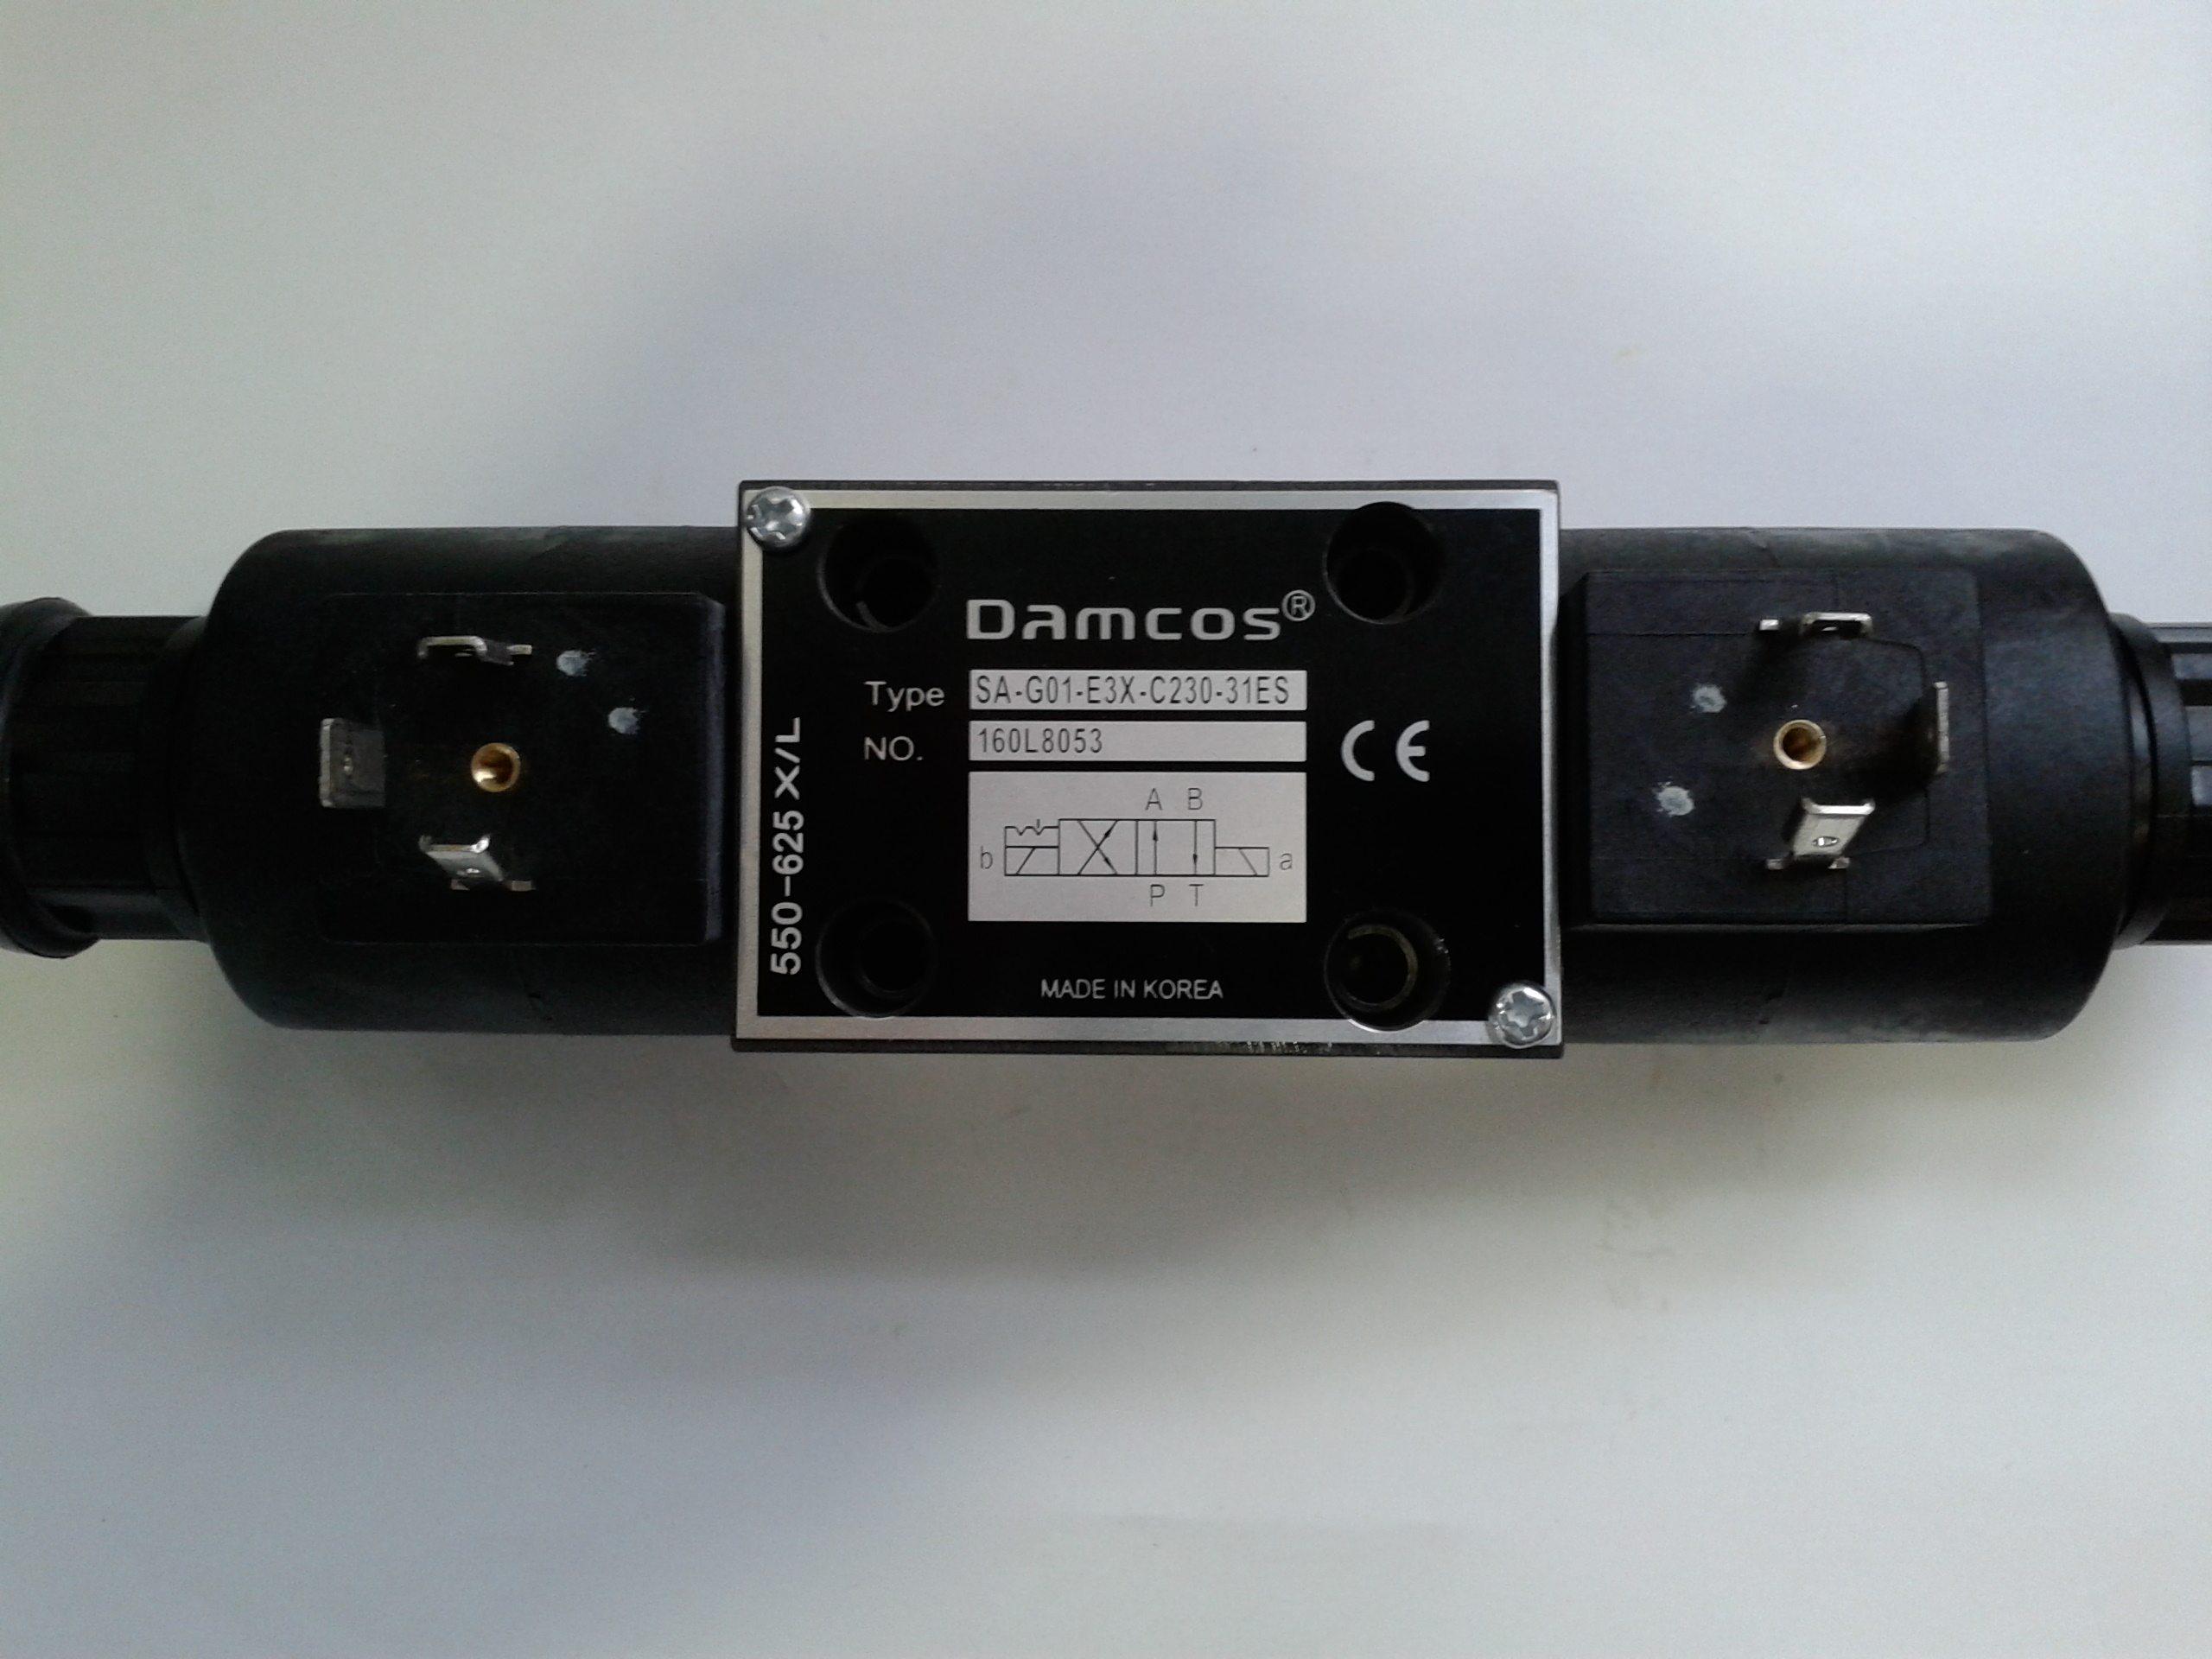 Damcos-Solenoid-Valve-Solenoid-Valve-42-1-0-S-220240VAC-5060-SA-G01-E3X-C230-31ES-Part-No.-160L8052-Replaced-by-160L8053